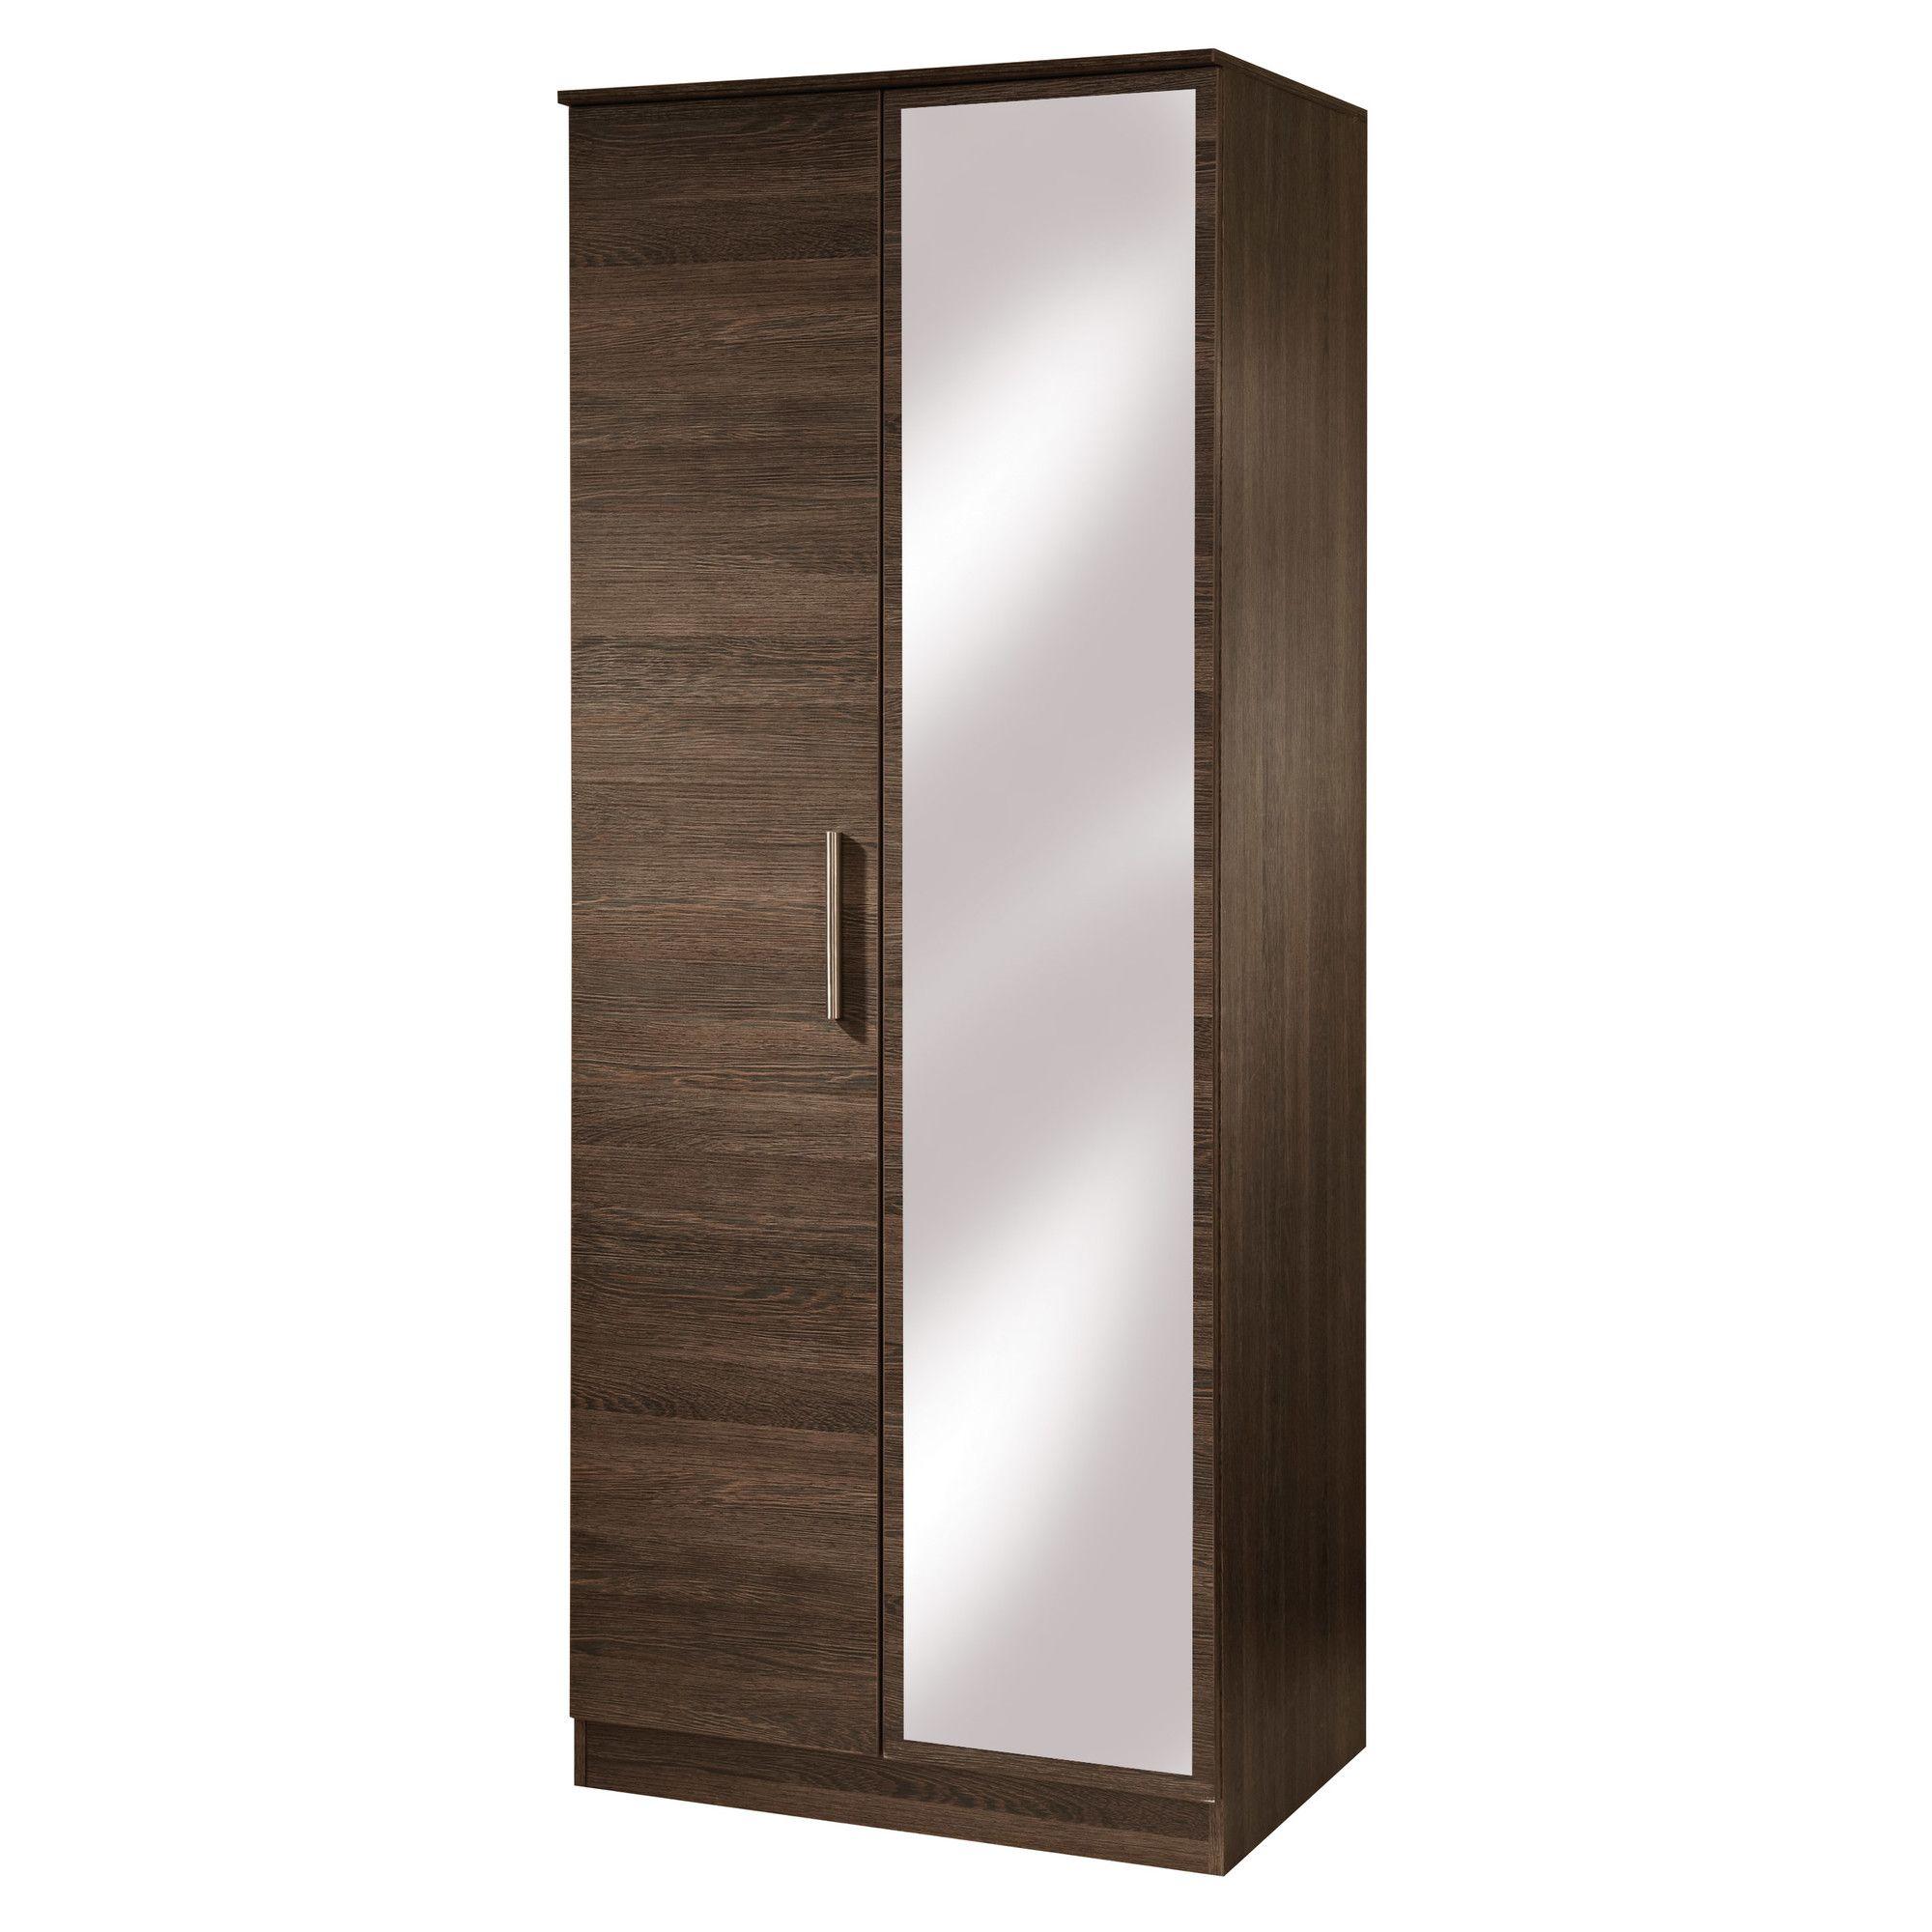 Welcome Furniture Contrast Tall Mirror Wardrobe - Panga at Tesco Direct